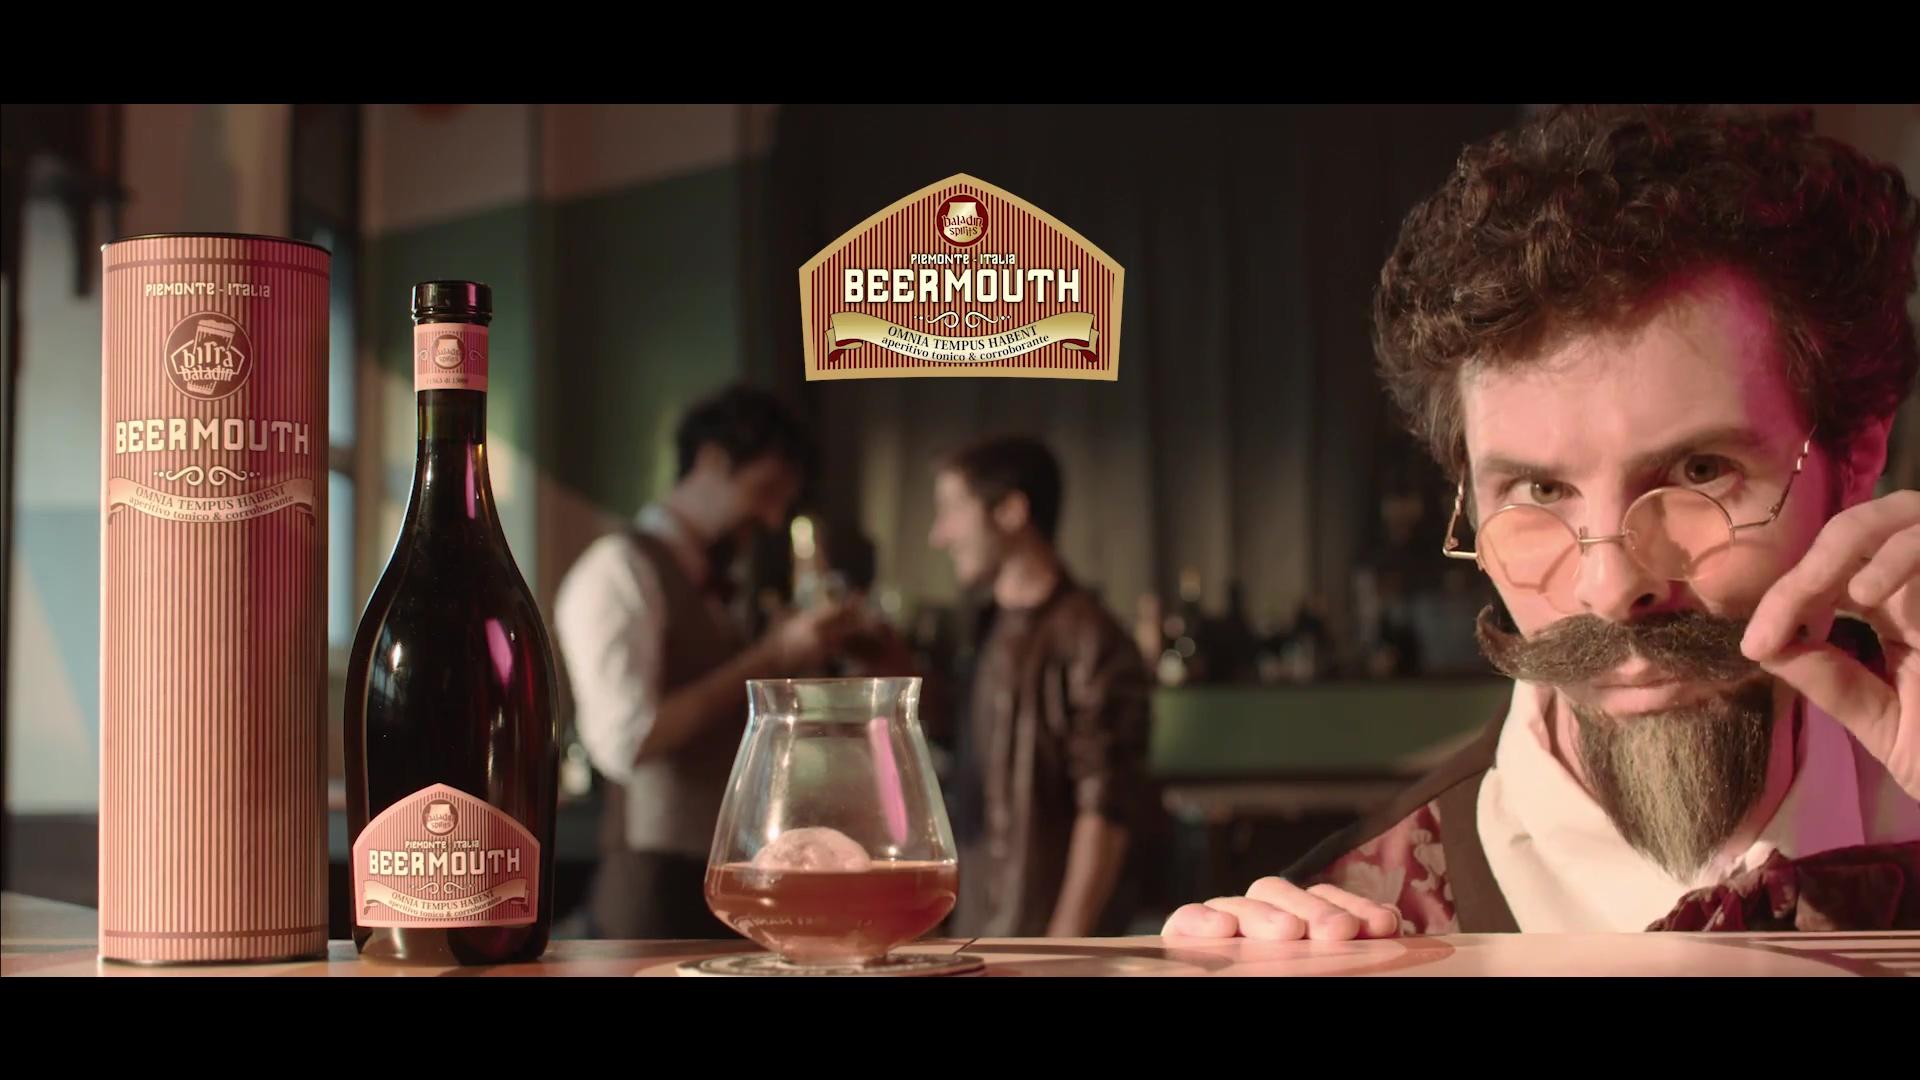 Beermouth_15_versione_2